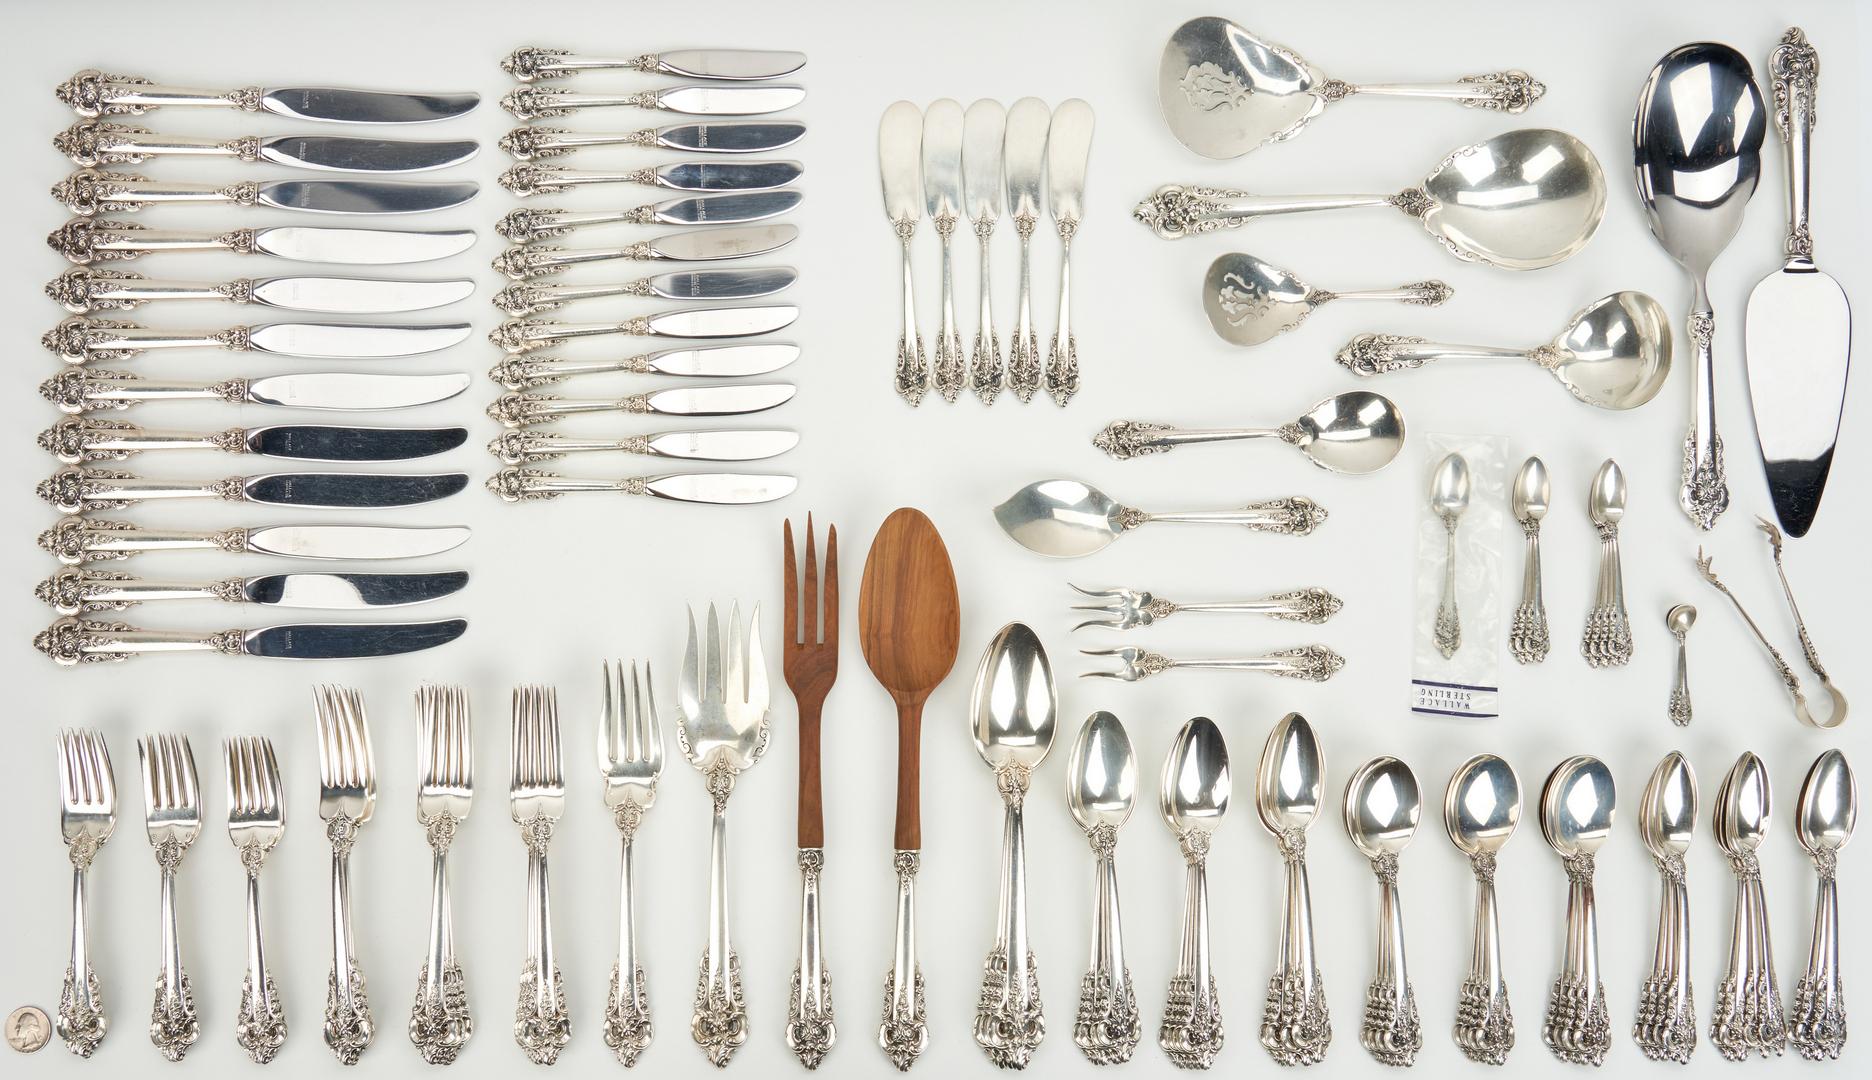 Lot 237: 117 pcs. Wallace Grand Baroque Sterling Silver Flatware